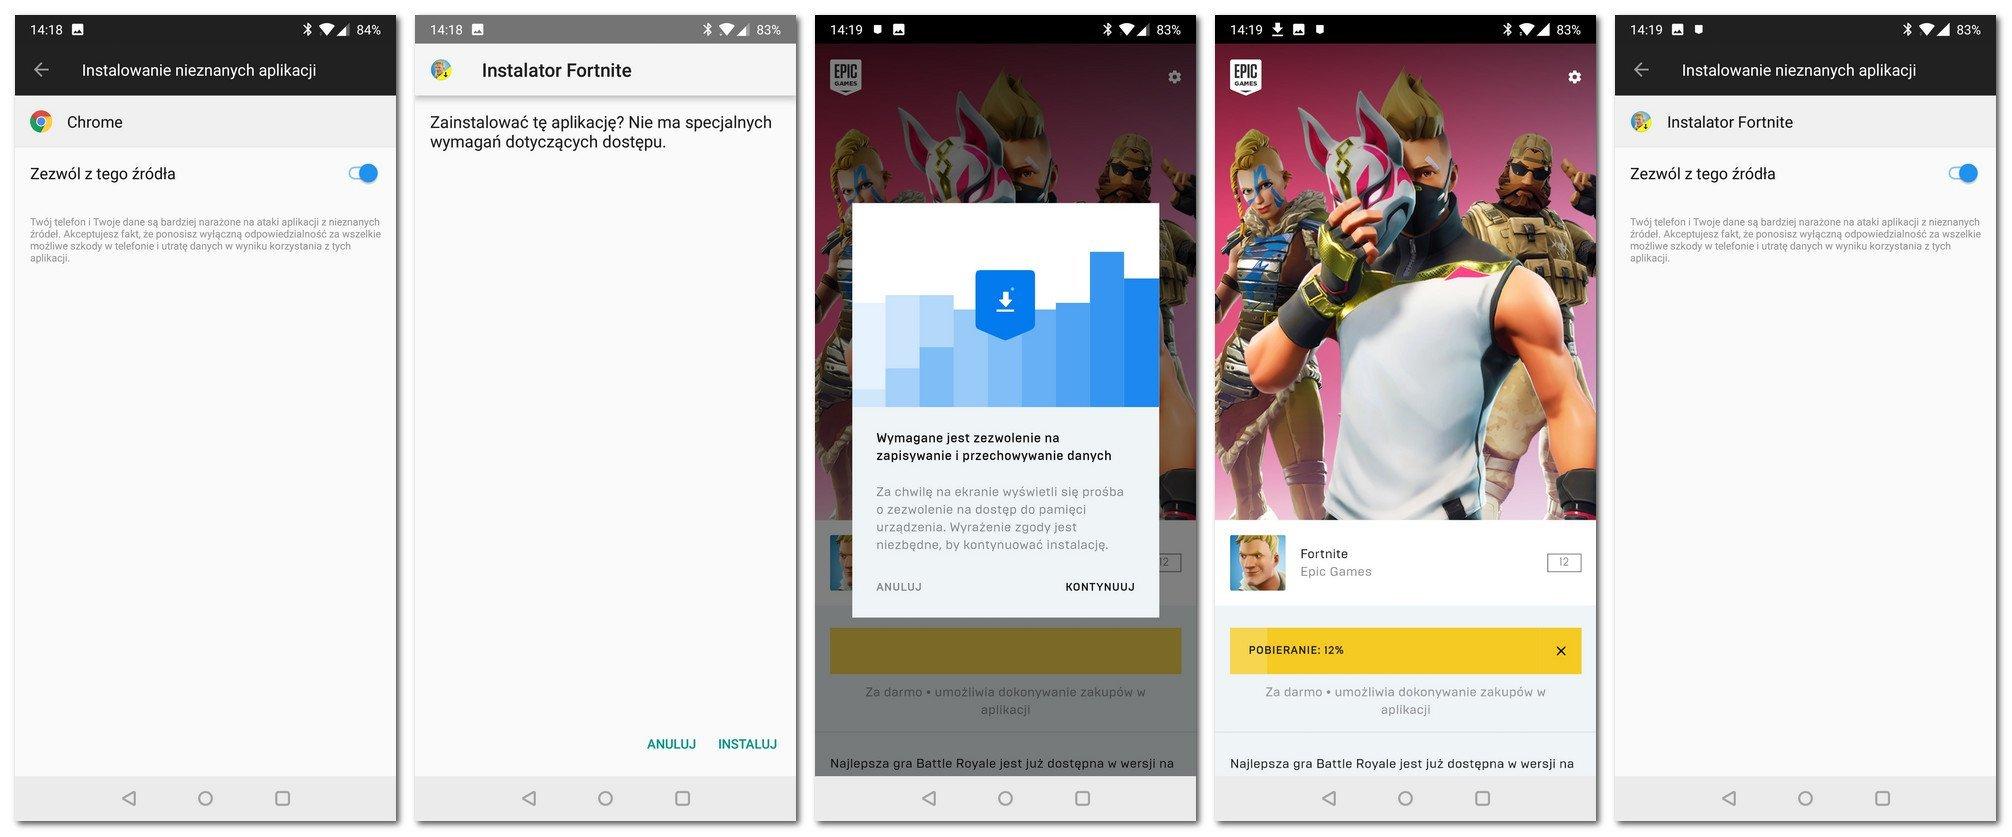 Fortnite Android pobranie i instalacja